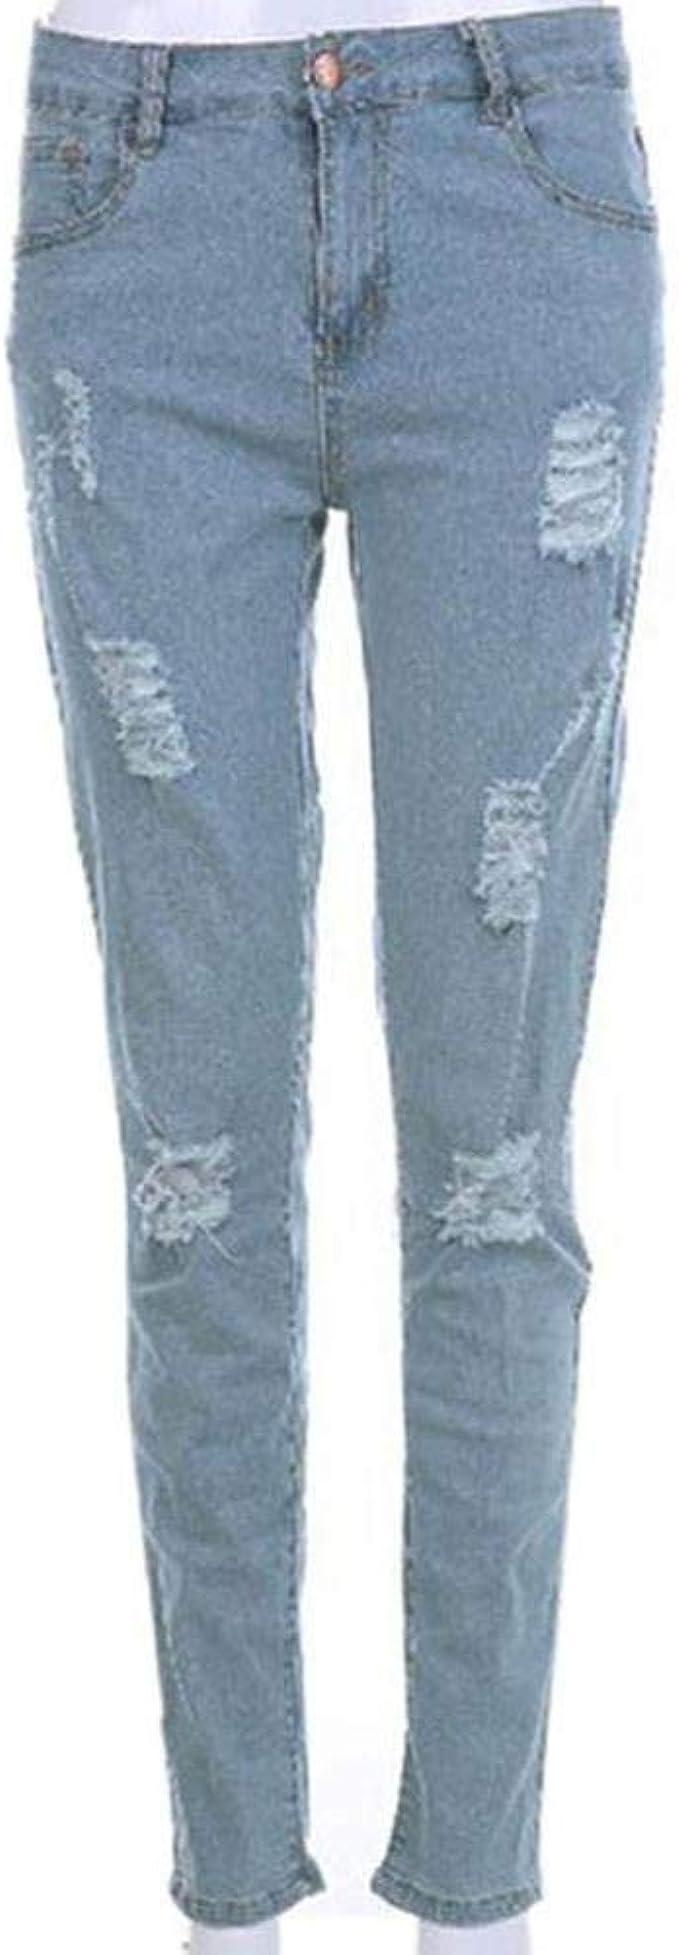 Denim Pants Printemps Jeans Biker Rider Extensible Skinny